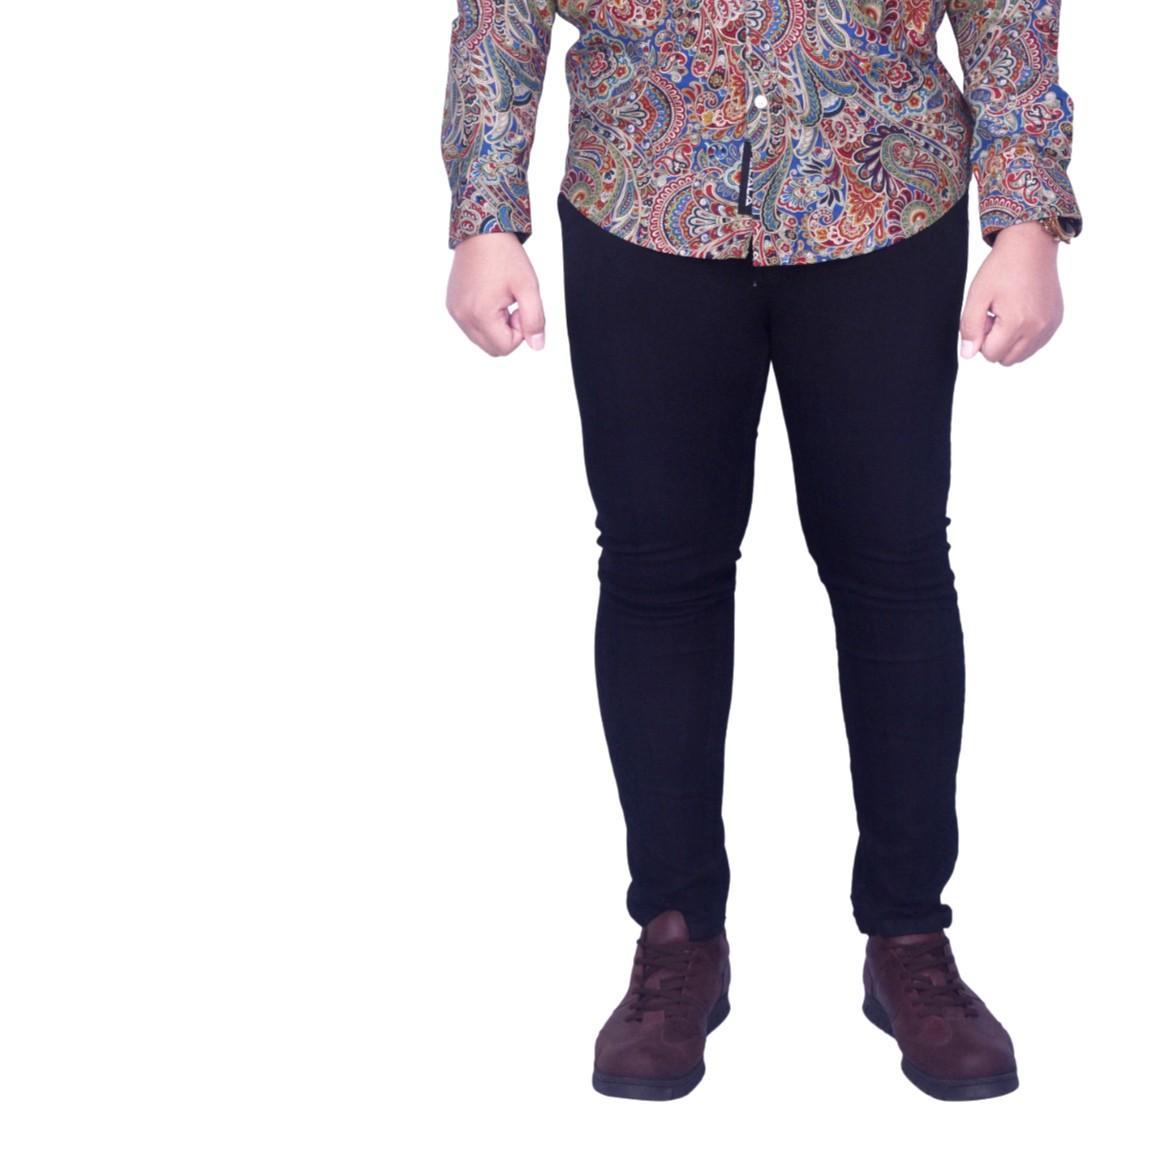 Buy Sell Cheapest Celana Soft Chino Best Quality Product Deals Panjang Htam Bsg Fashion1 Hitam Jeans Murah Denim Polos Semi Distro Pendekcelana